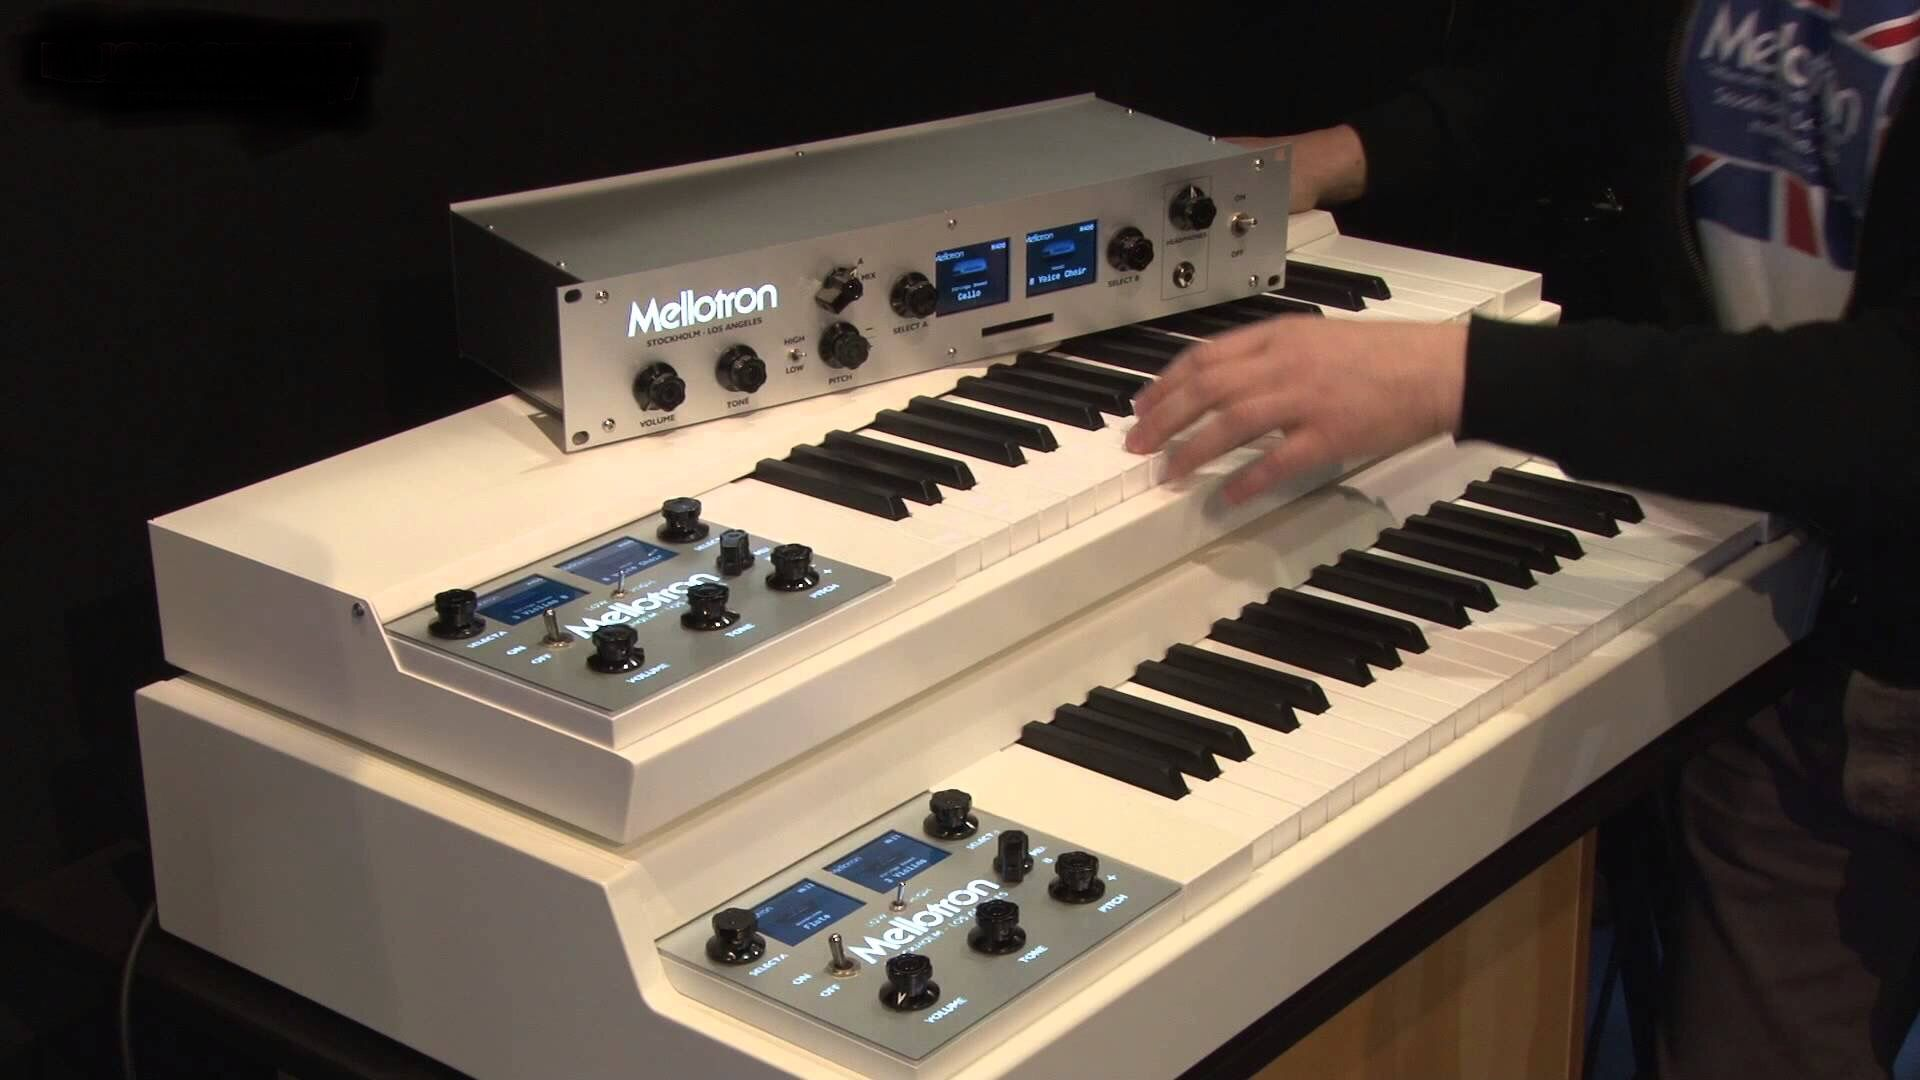 Mellotron M4000D, M4000D Mini, M4000D Rack, digital sample